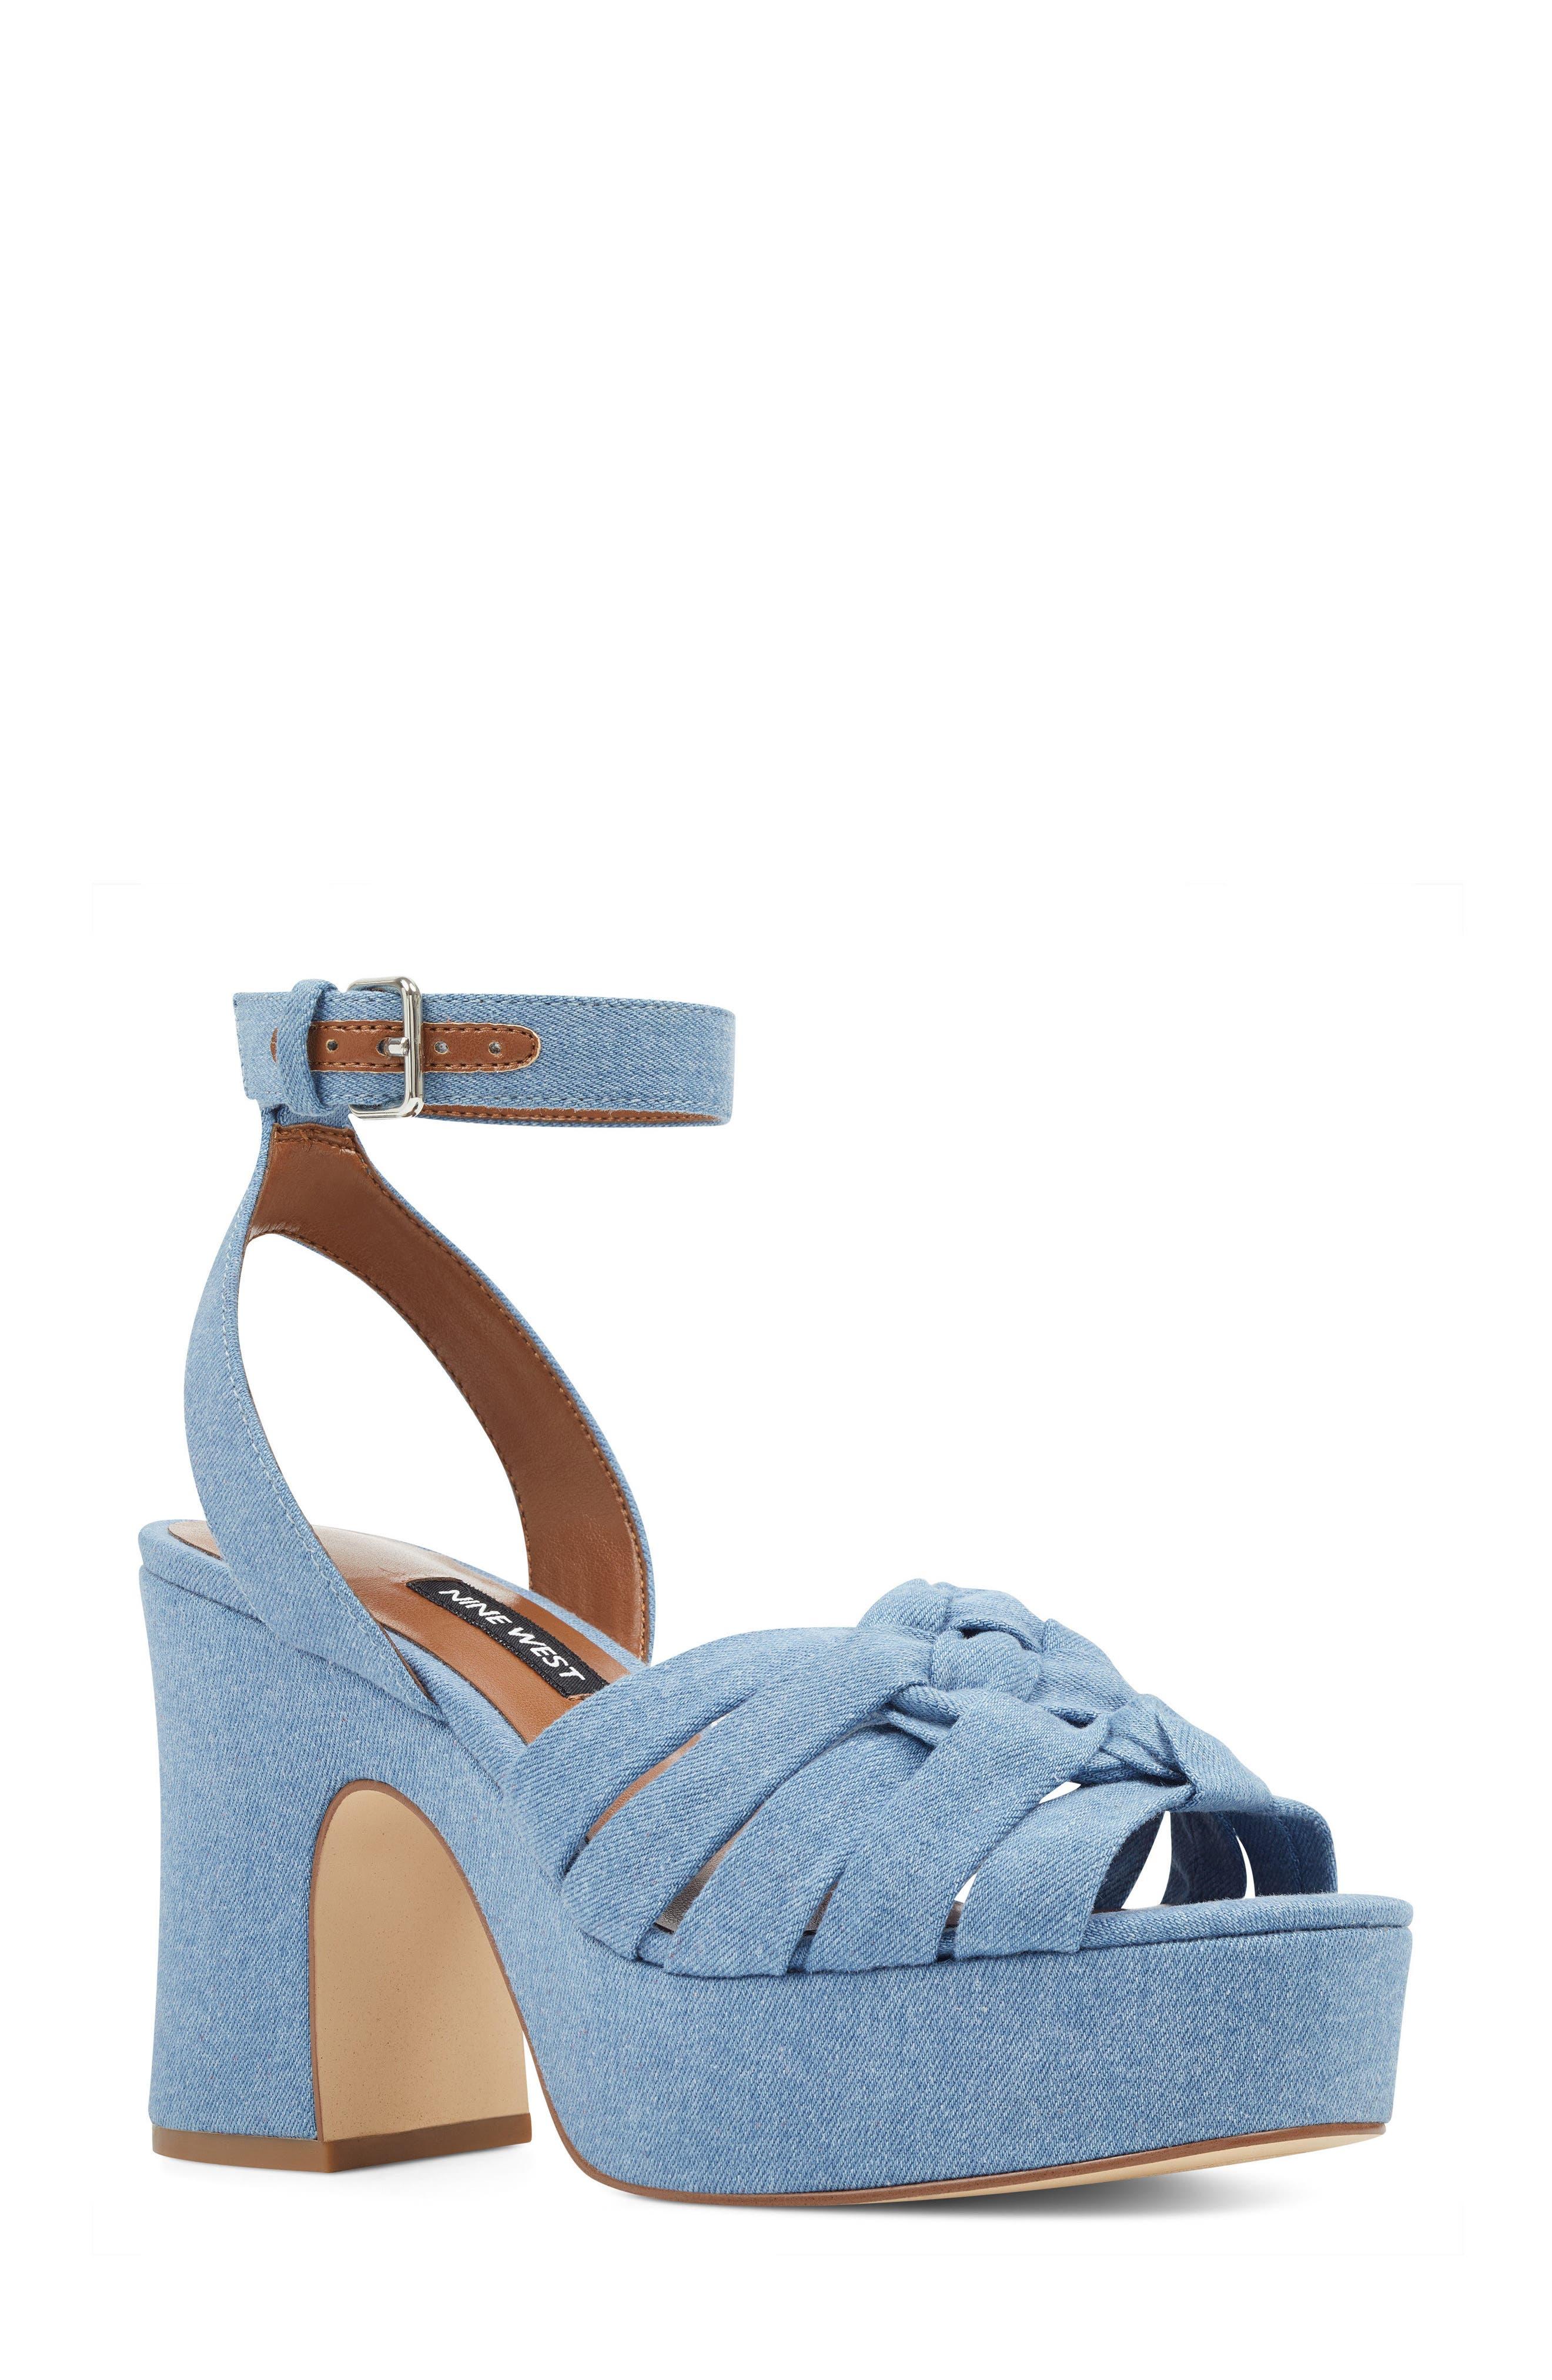 Fetuchini Platform Sandal,                         Main,                         color, LIGHT BLUE DENIM